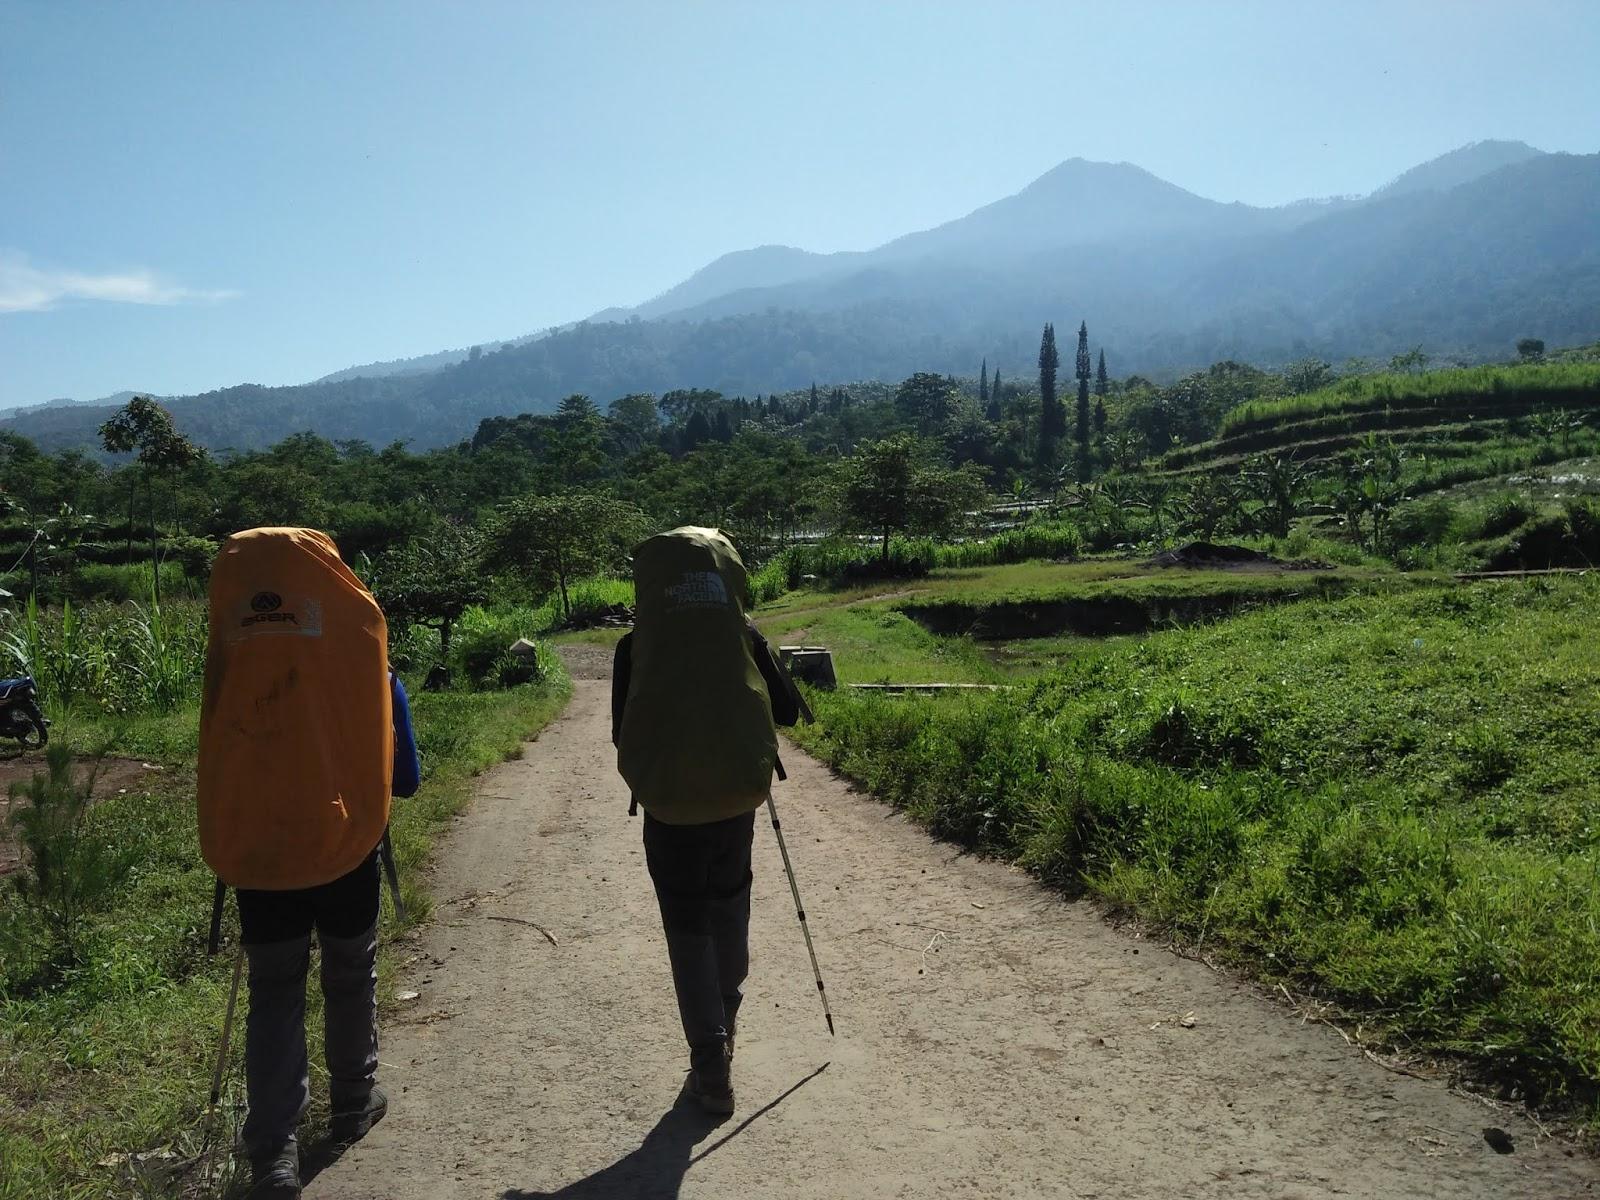 Pendakian Tiga Puncak Gunung Gunung Lawu Gunung Arjuno Welirang Gunung Argopuro